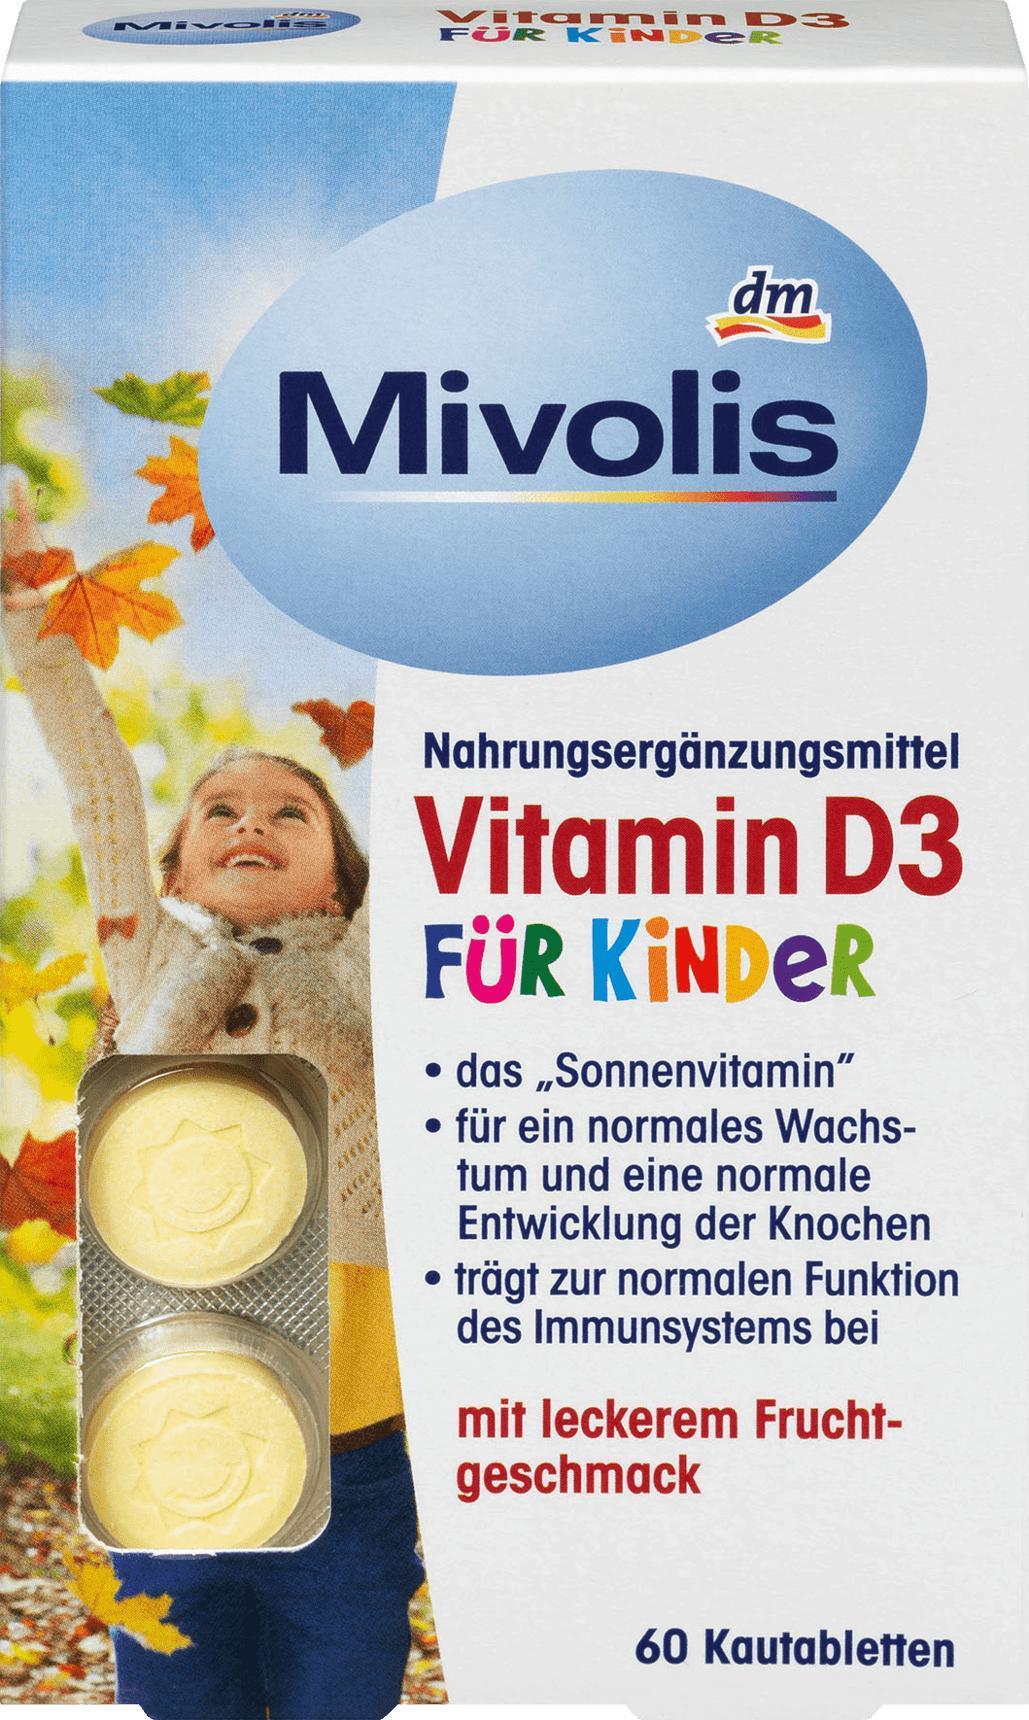 Отзыв на Vitamin D3 für Kinder, Kautabletten 60 St., 51 g из Интернет-Магазина DM